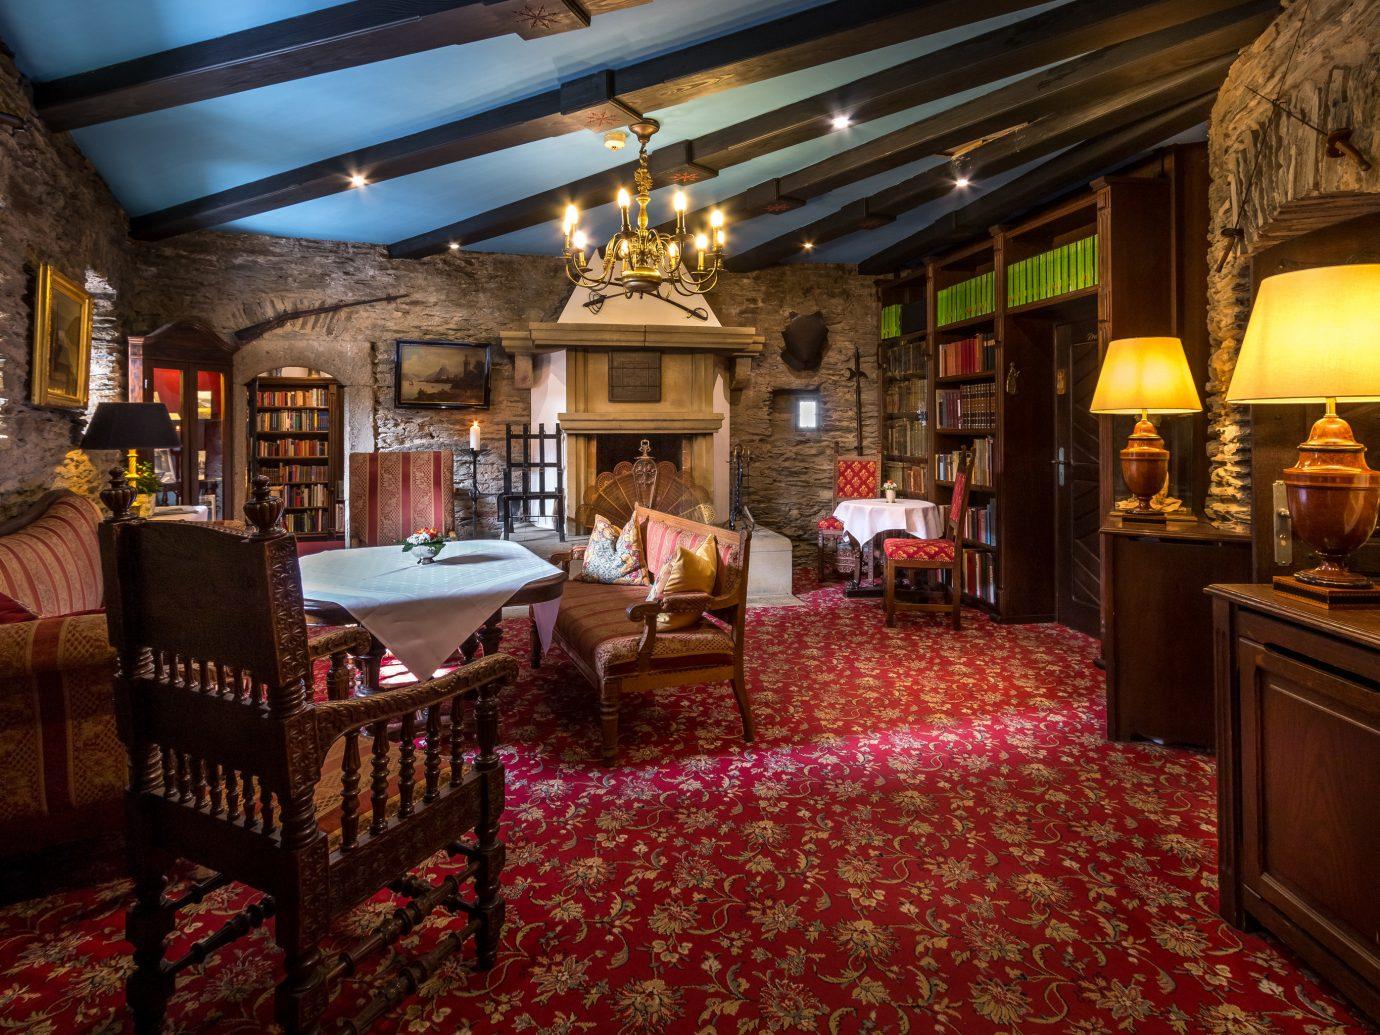 Hotels Landmarks Luxury Travel indoor floor room ceiling property estate Living Resort Lobby interior design recreation room furniture restaurant mansion area several